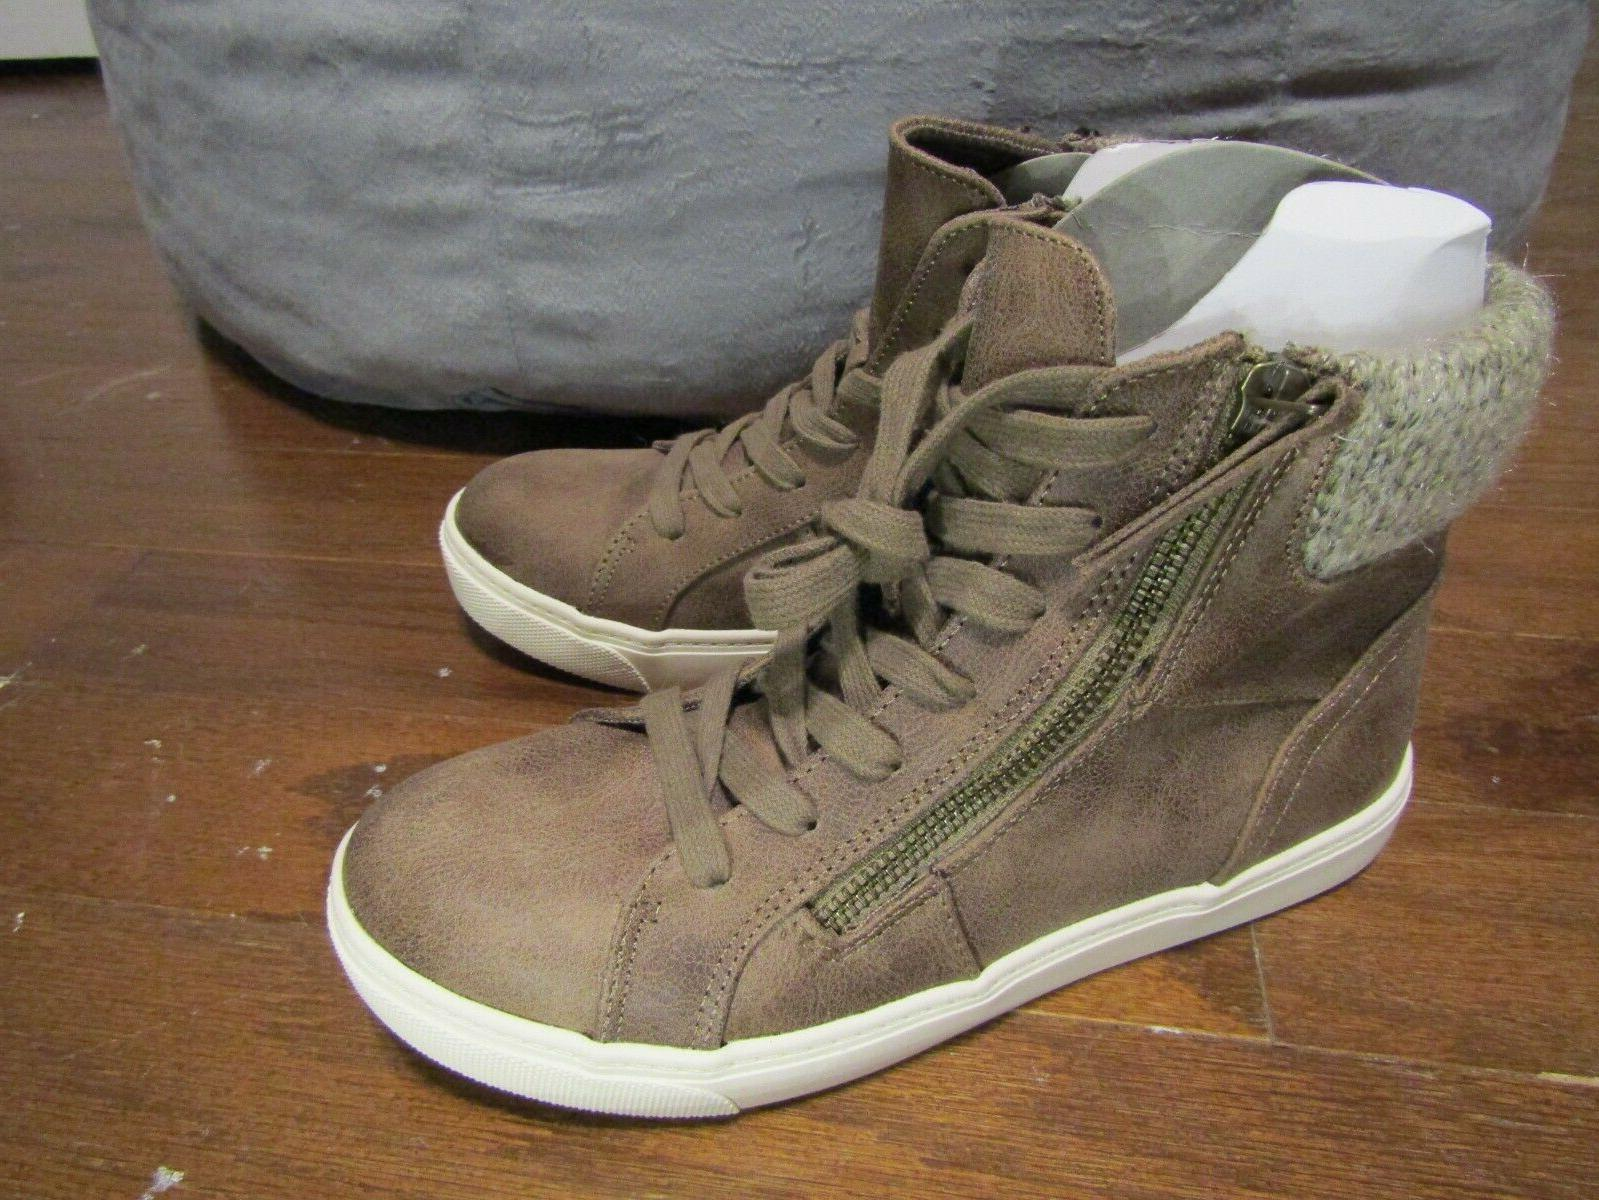 Curfew Hi Boots / Size